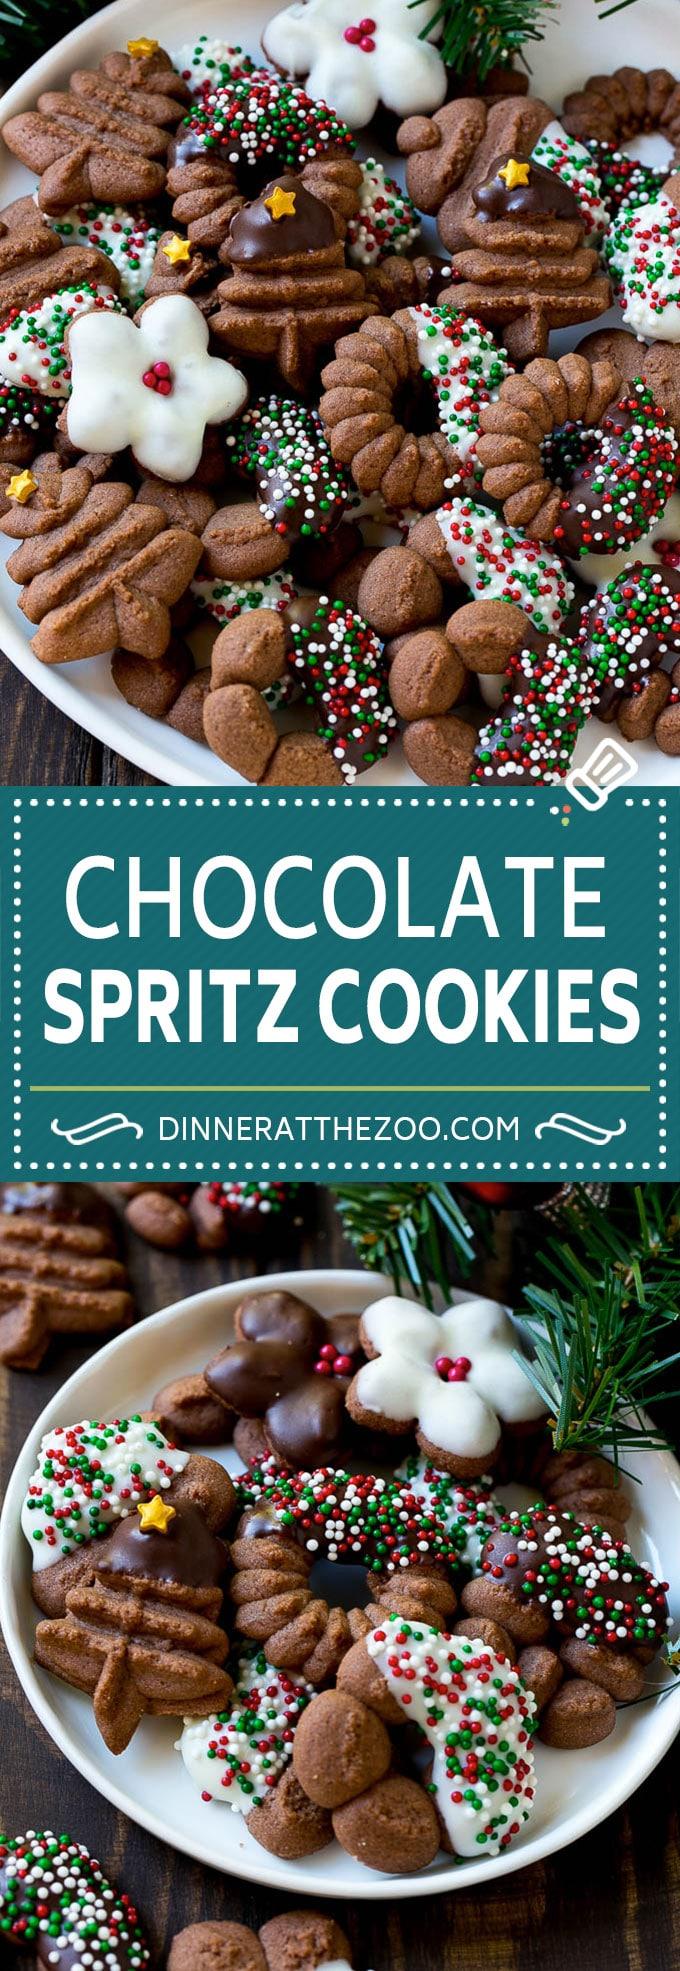 Chocolate Spritz Cookies | Christmas Cookies | Spritz Cookies #christmas #cookies #chocolate #sprinkles #baking #dessert #dinneratthezoo